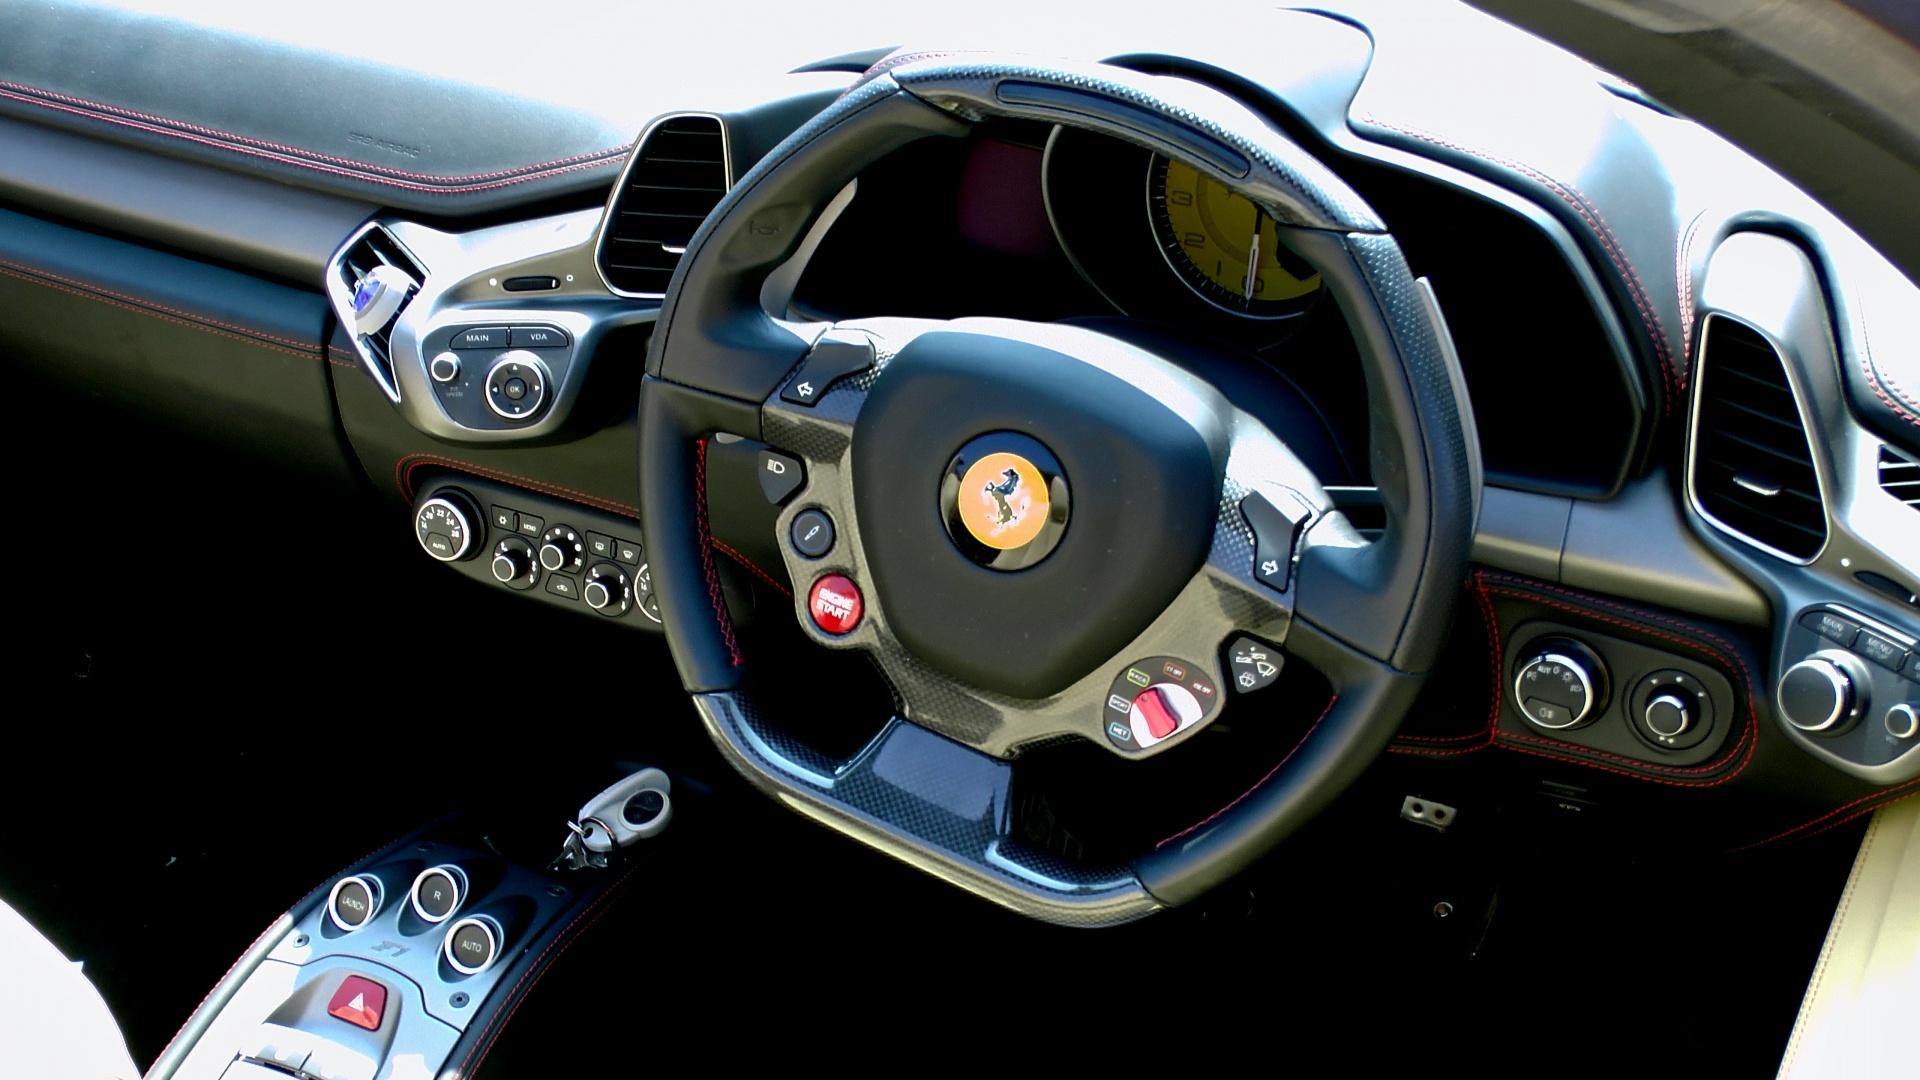 Ferrari Steering Wheel Wallpaper  X Px Hdwallsource Com Ferrari Steering Wheel Dashboard Free Stock Photo Public Domain